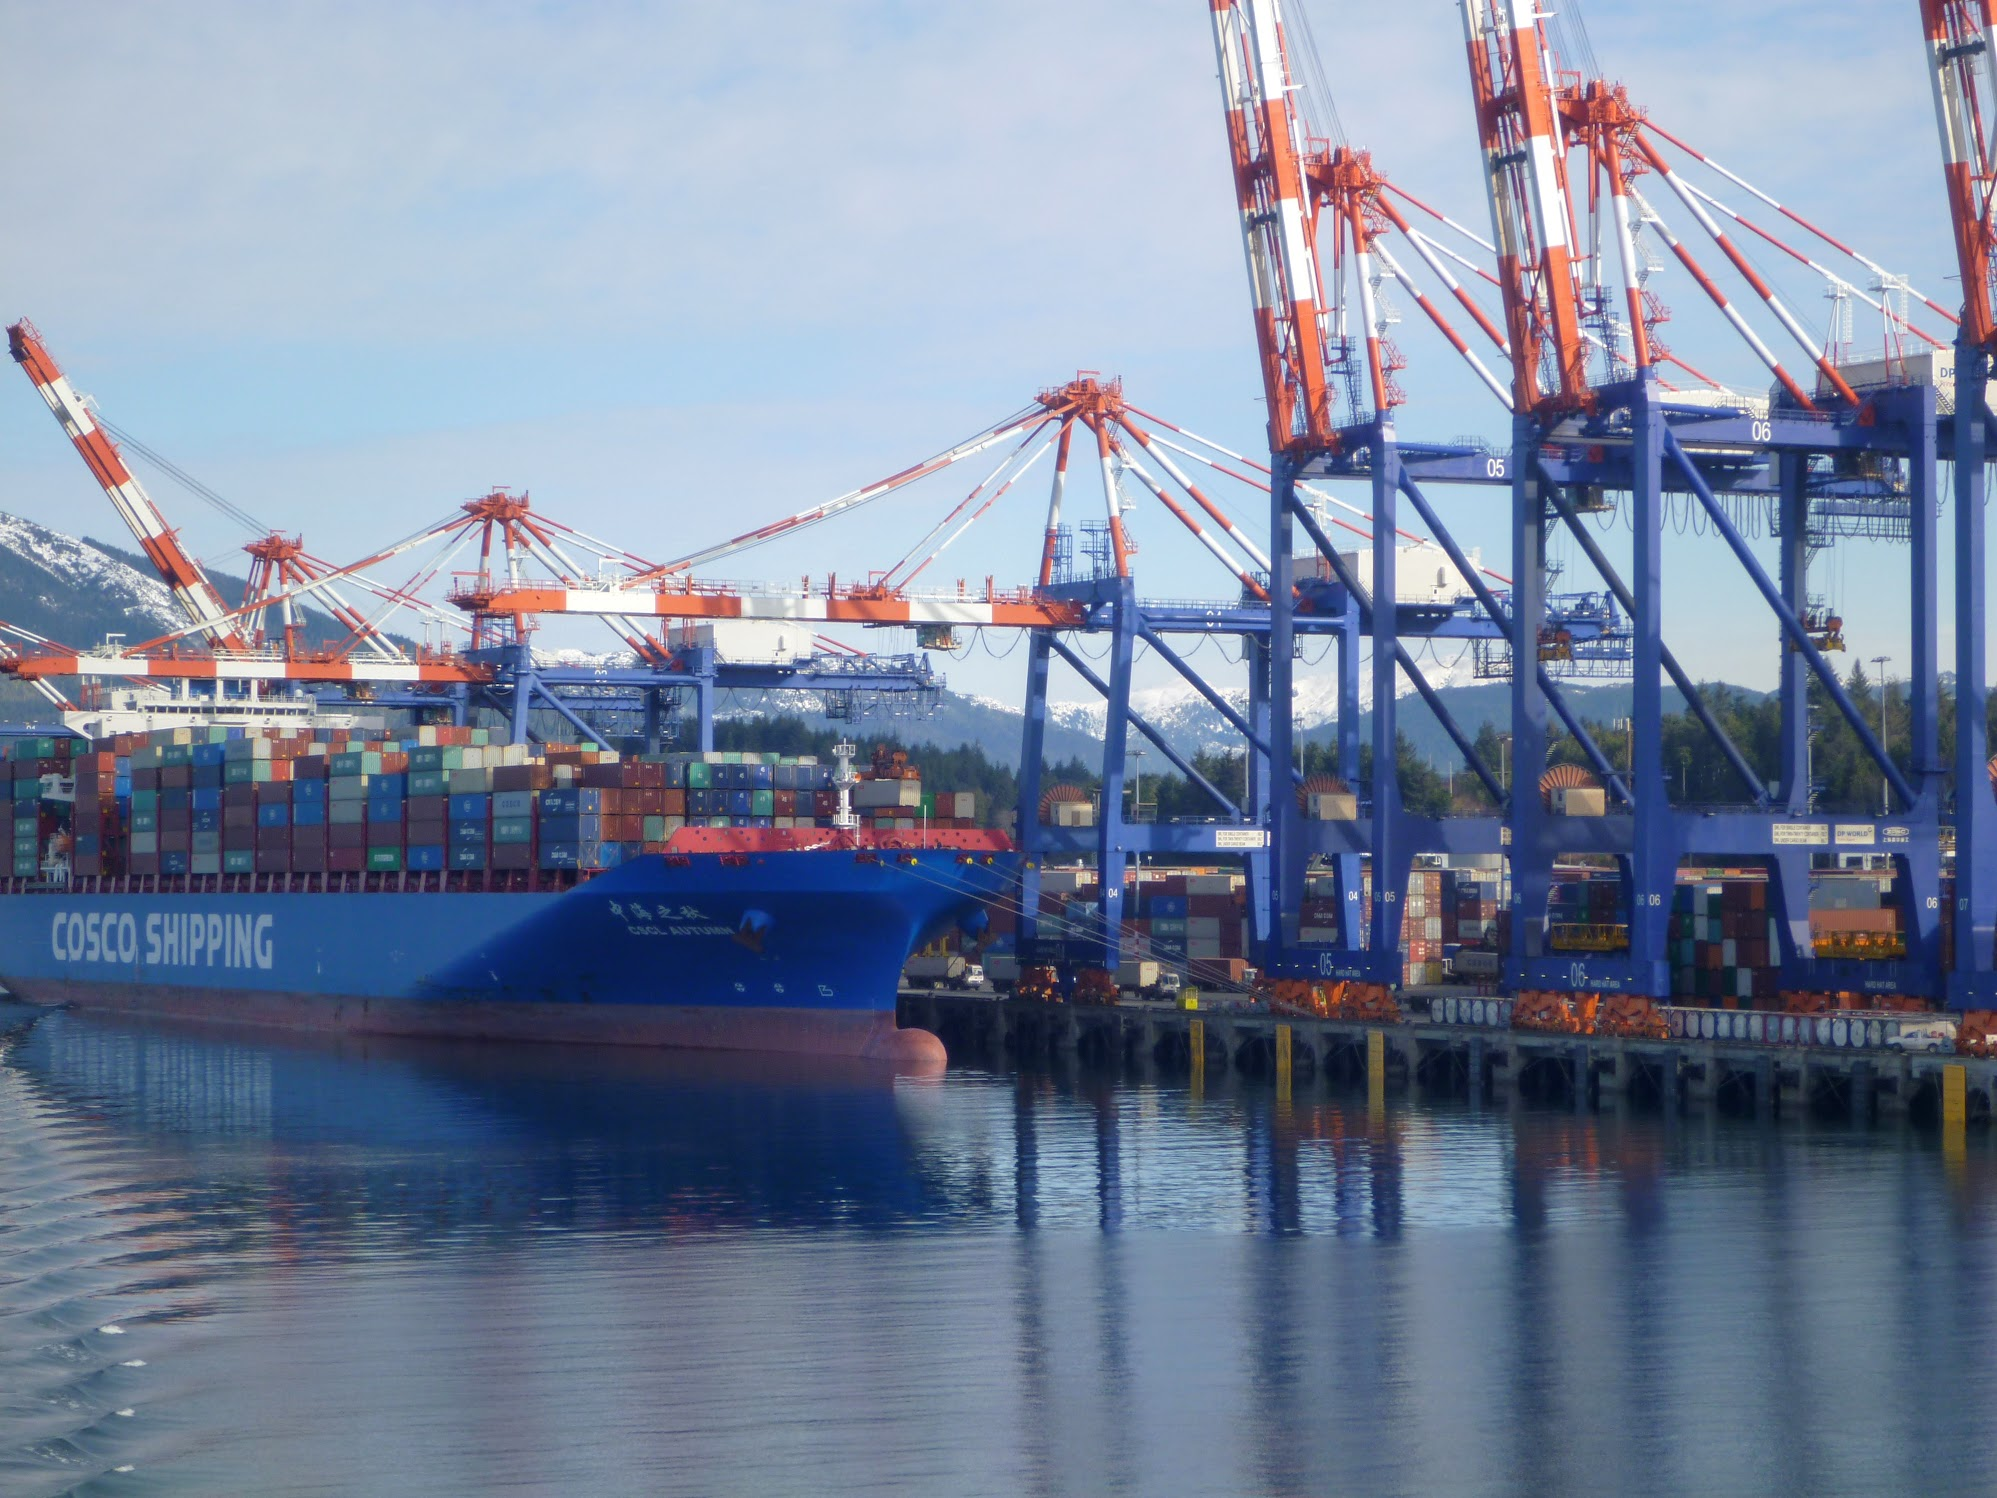 Docks by Prince Rupert.